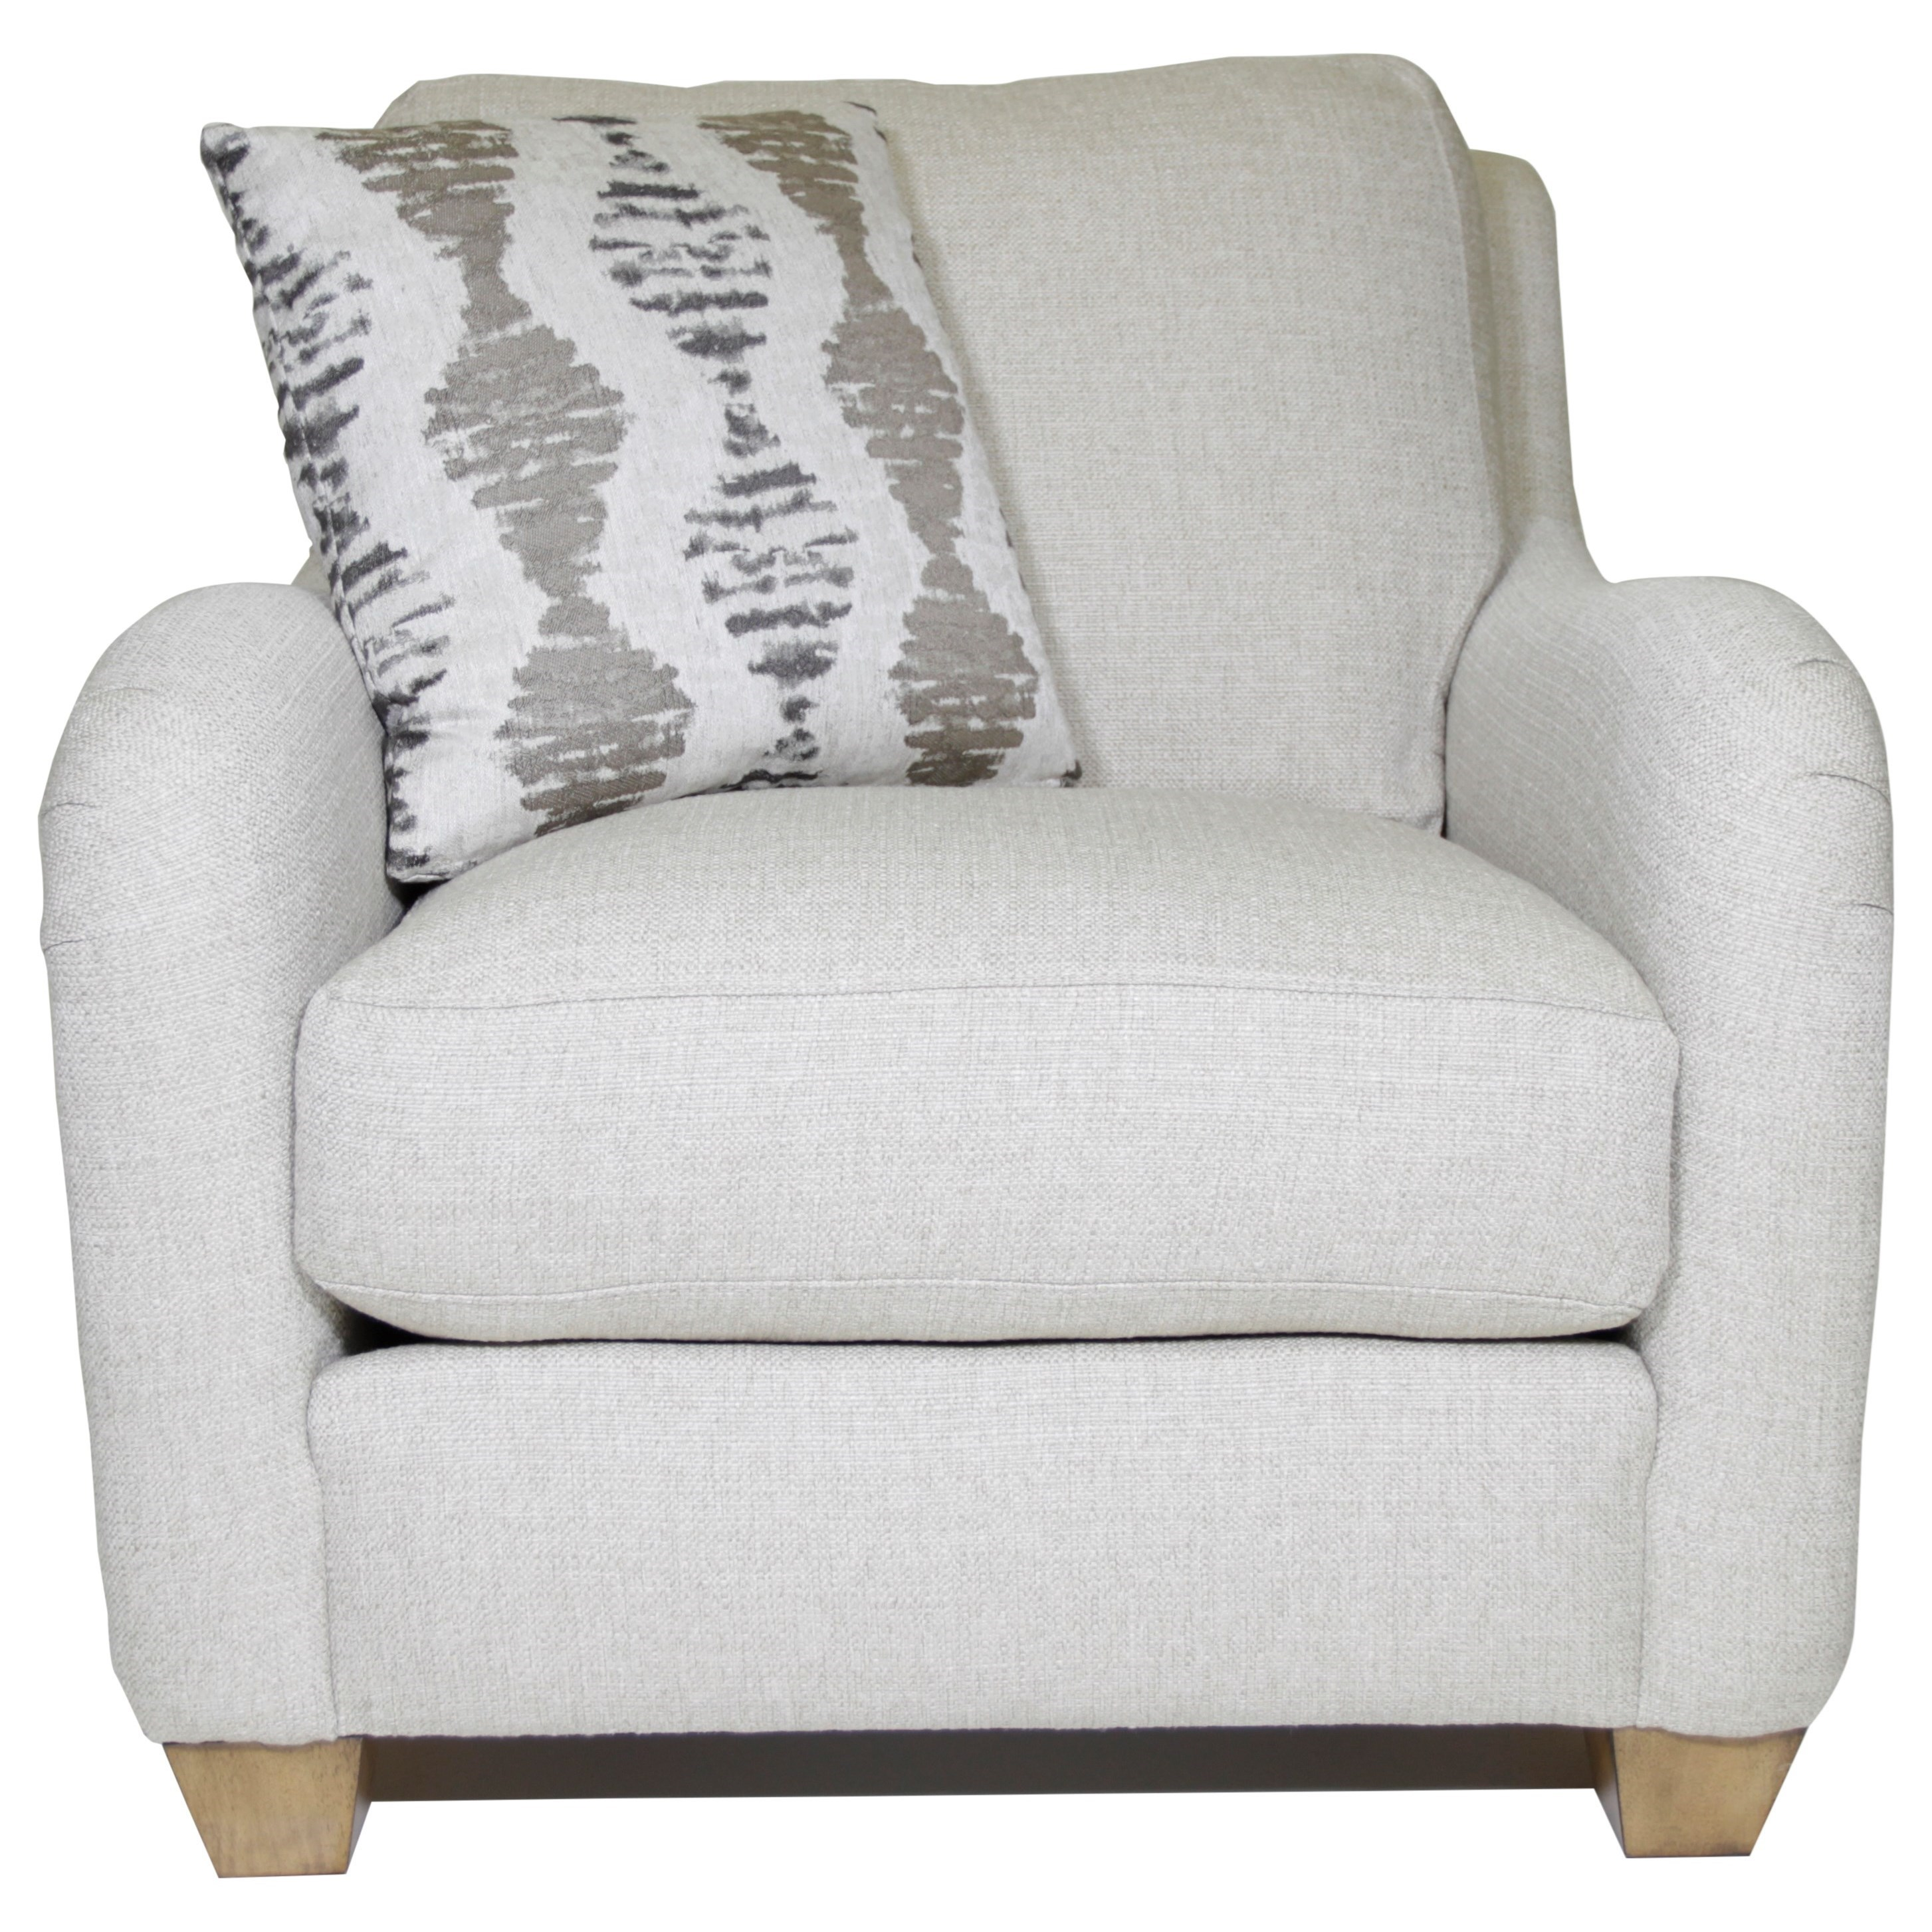 Flexsteel Fortuna Chair - Item Number: 7908-10-145-11